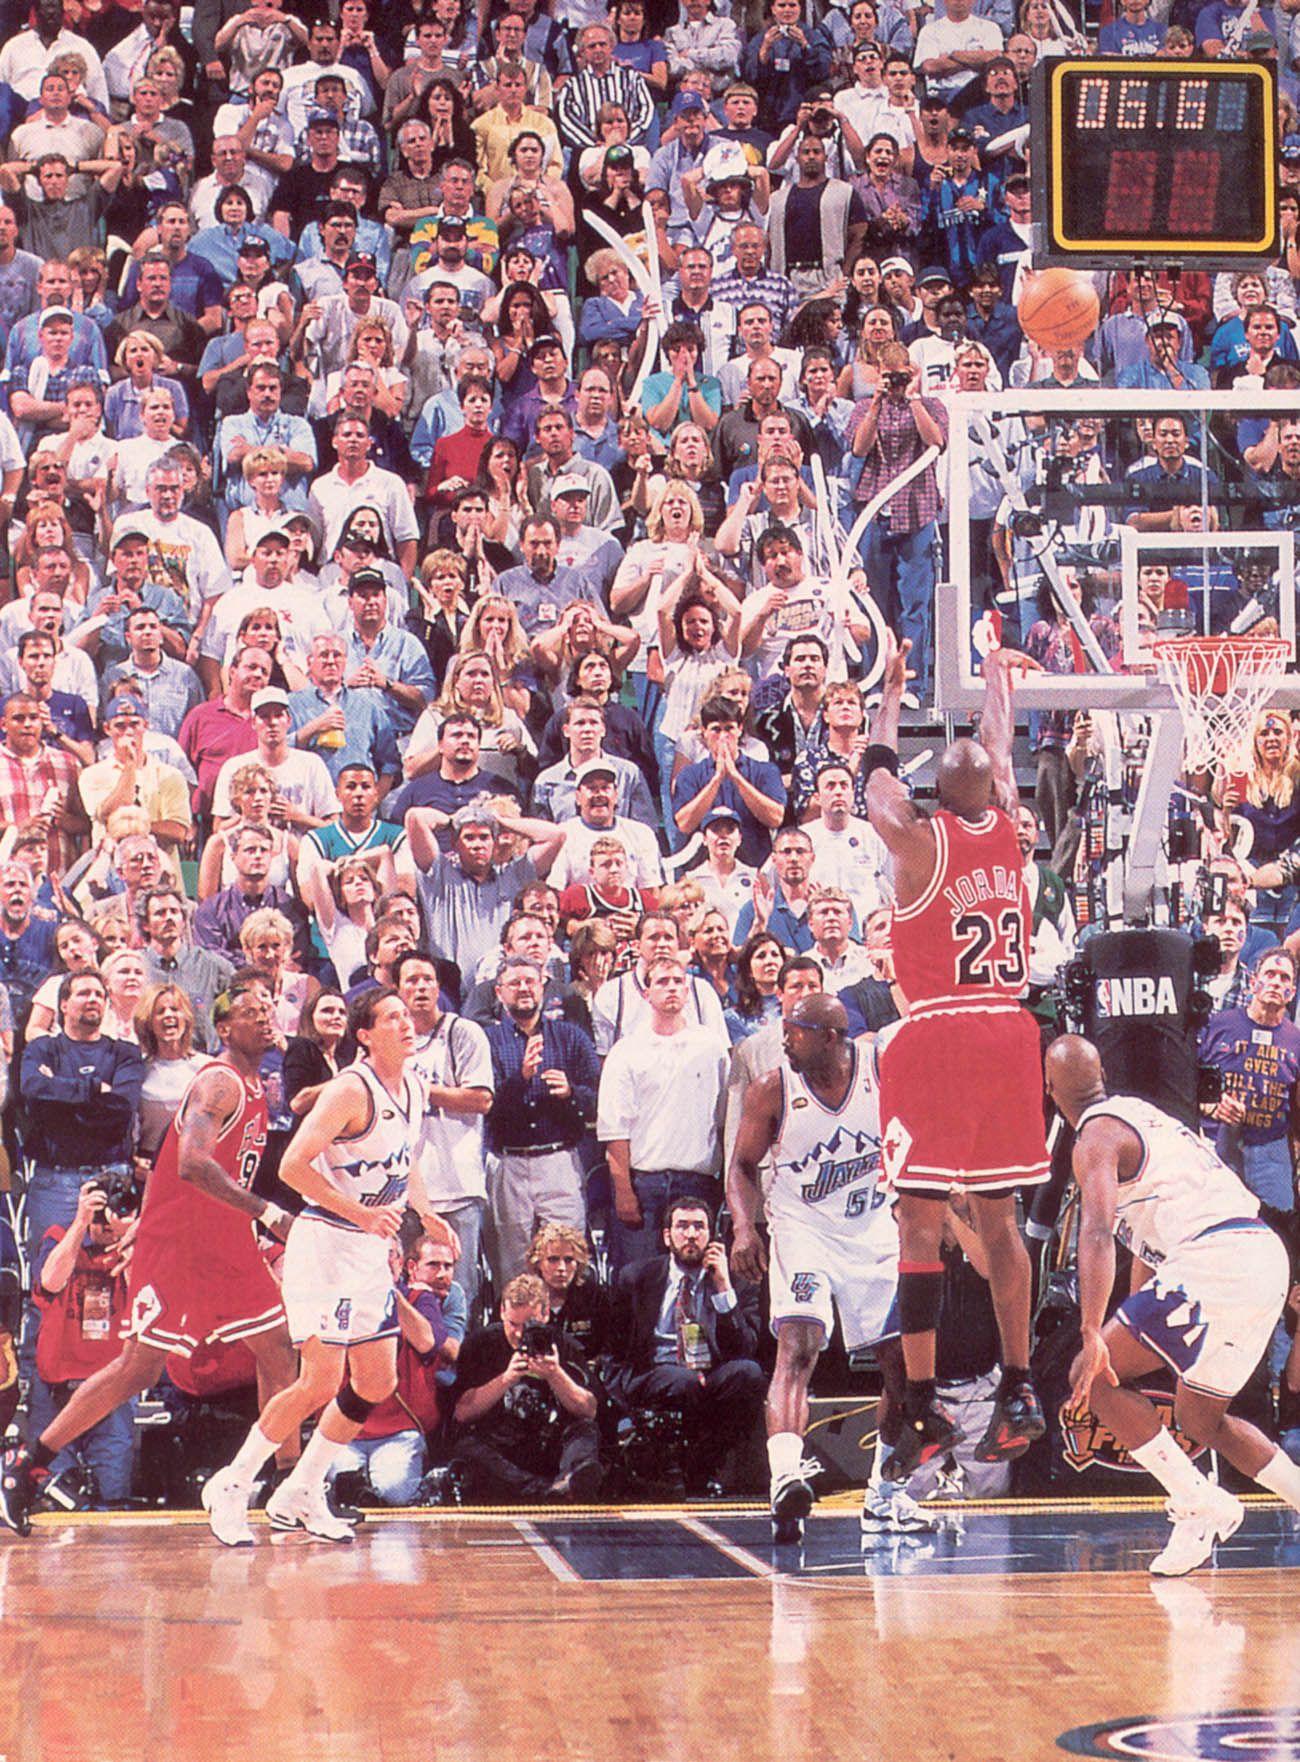 Michael Jordan championship game-winning shot against Utah Jazz in Game 6  of 1998 NBA finals 08e907a38